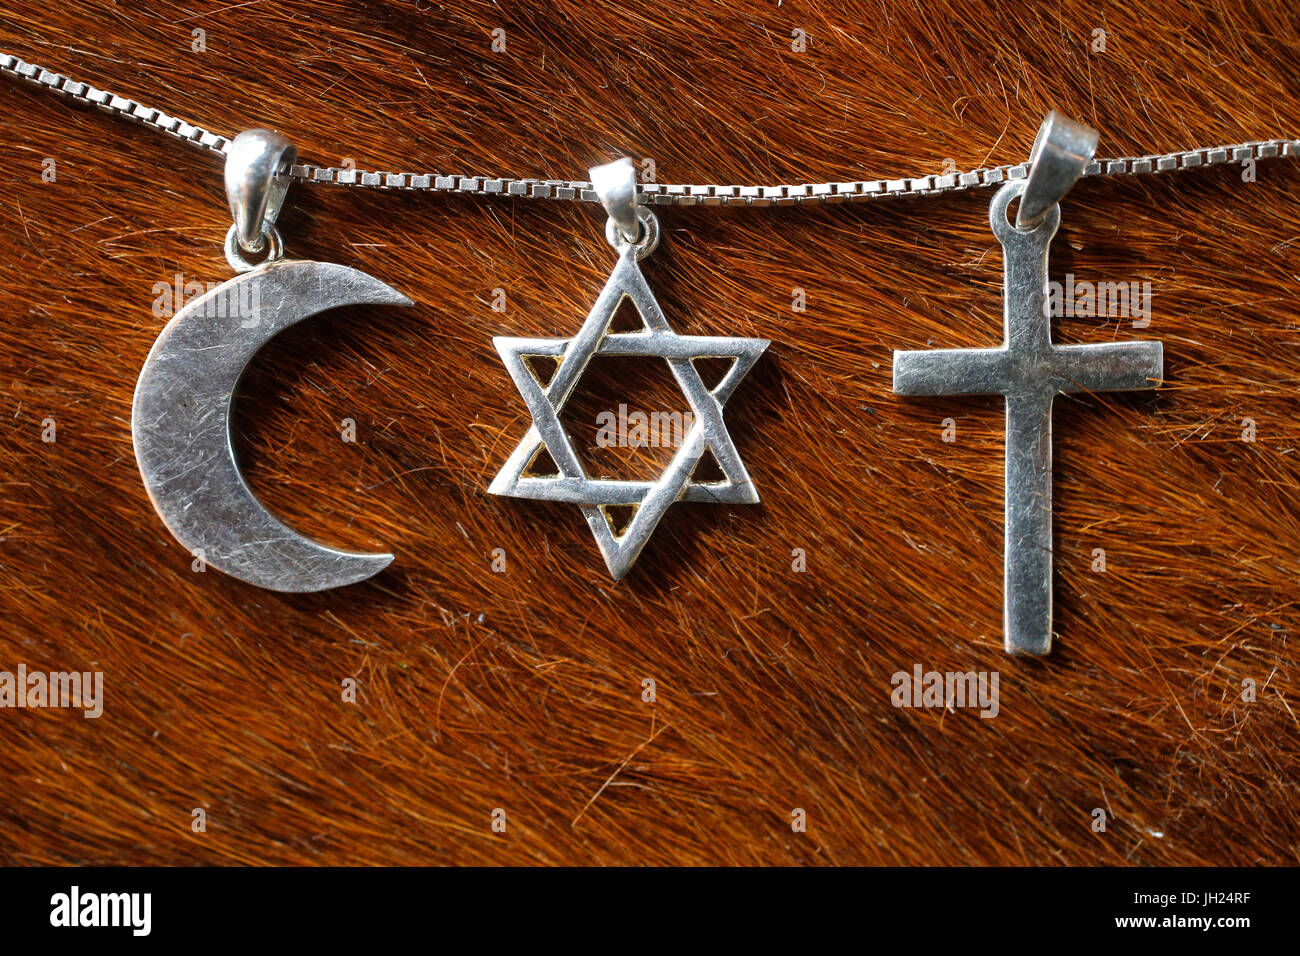 Symbols of islam, judaism and christianity. - Stock Image